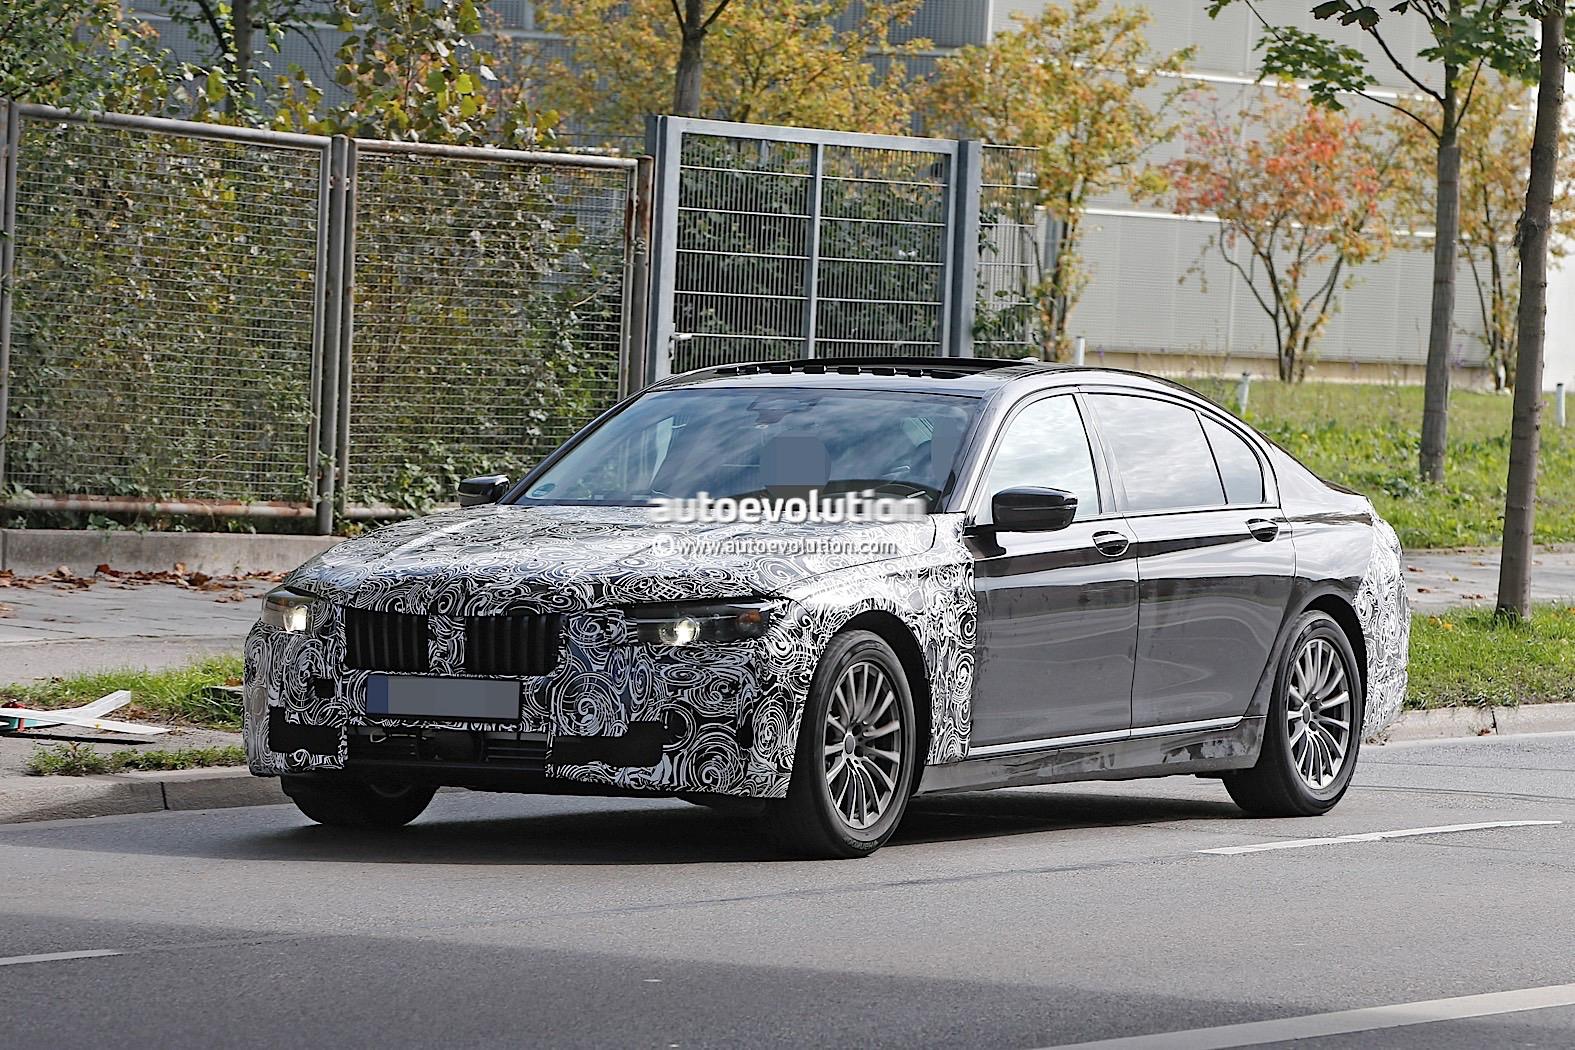 Spyshots 2019 BMW 7 Series LCI To Get Major Styling Refresh